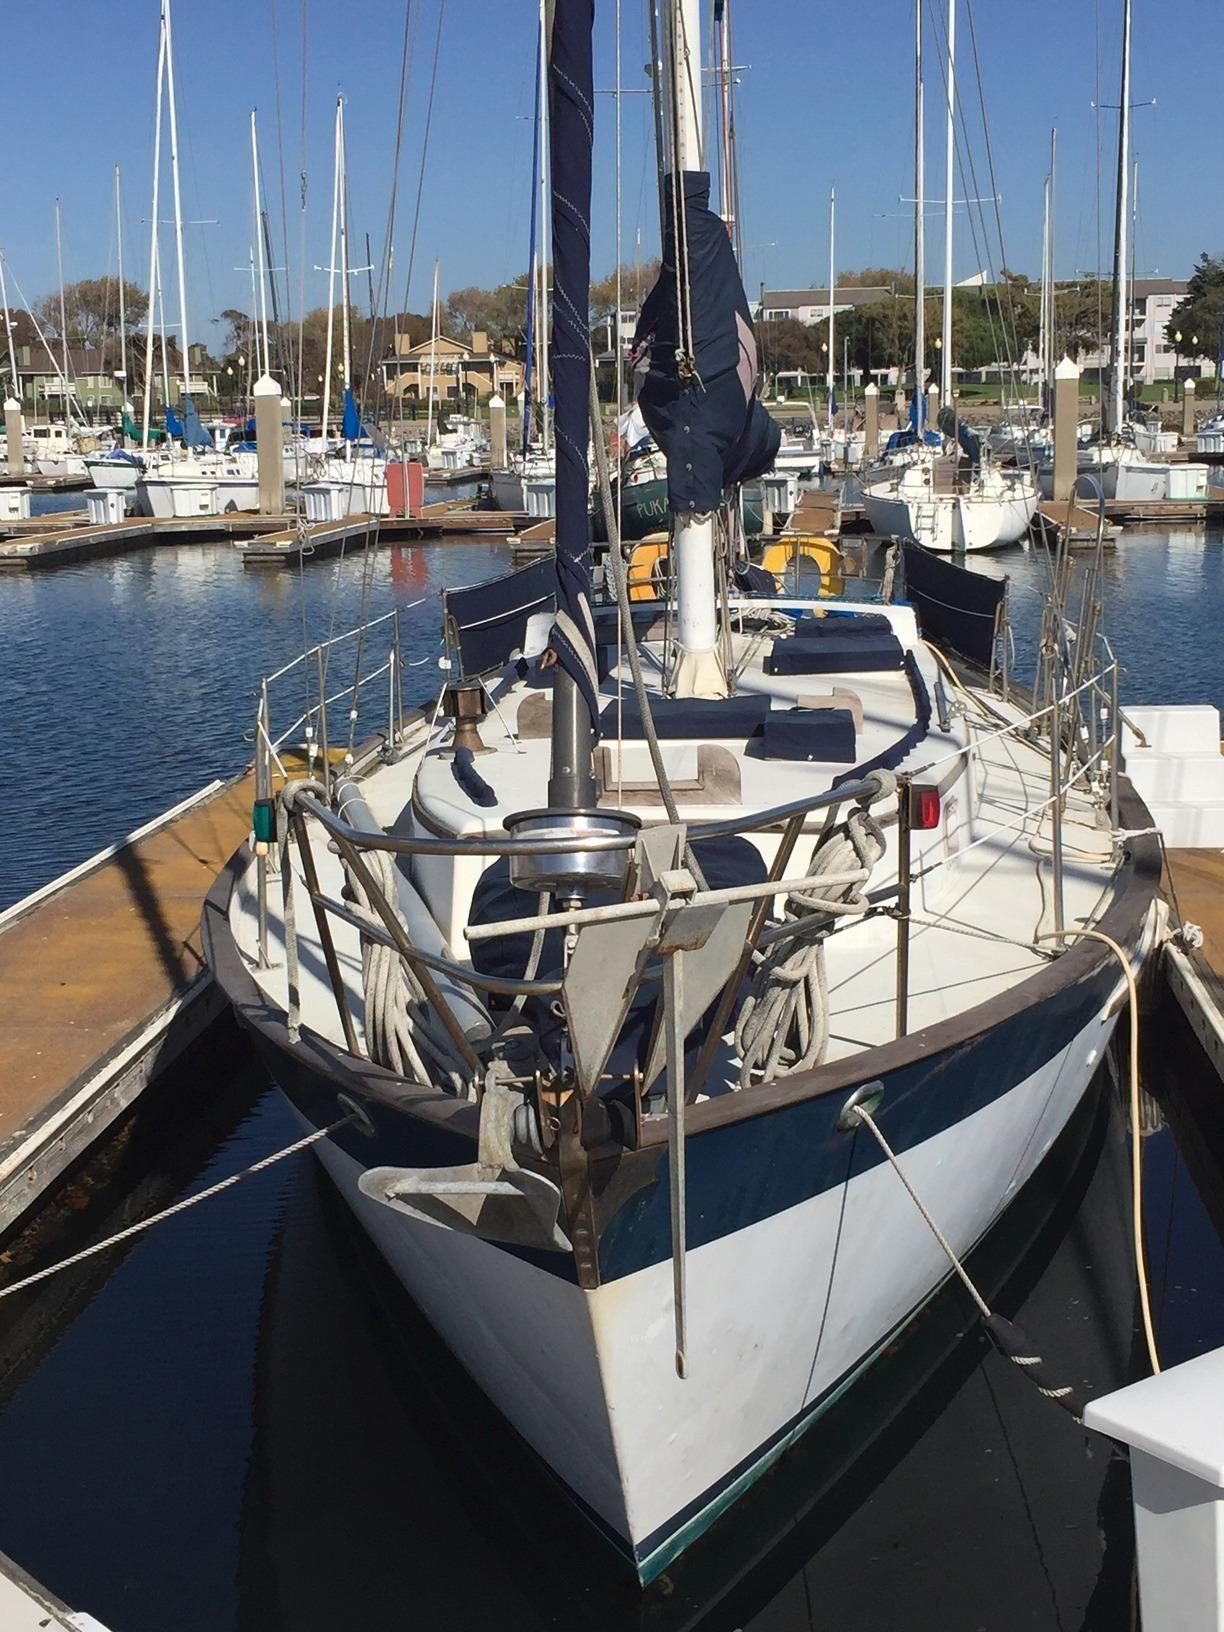 1981 Valiant 40 CT Sailboat Sail Boat For Sale